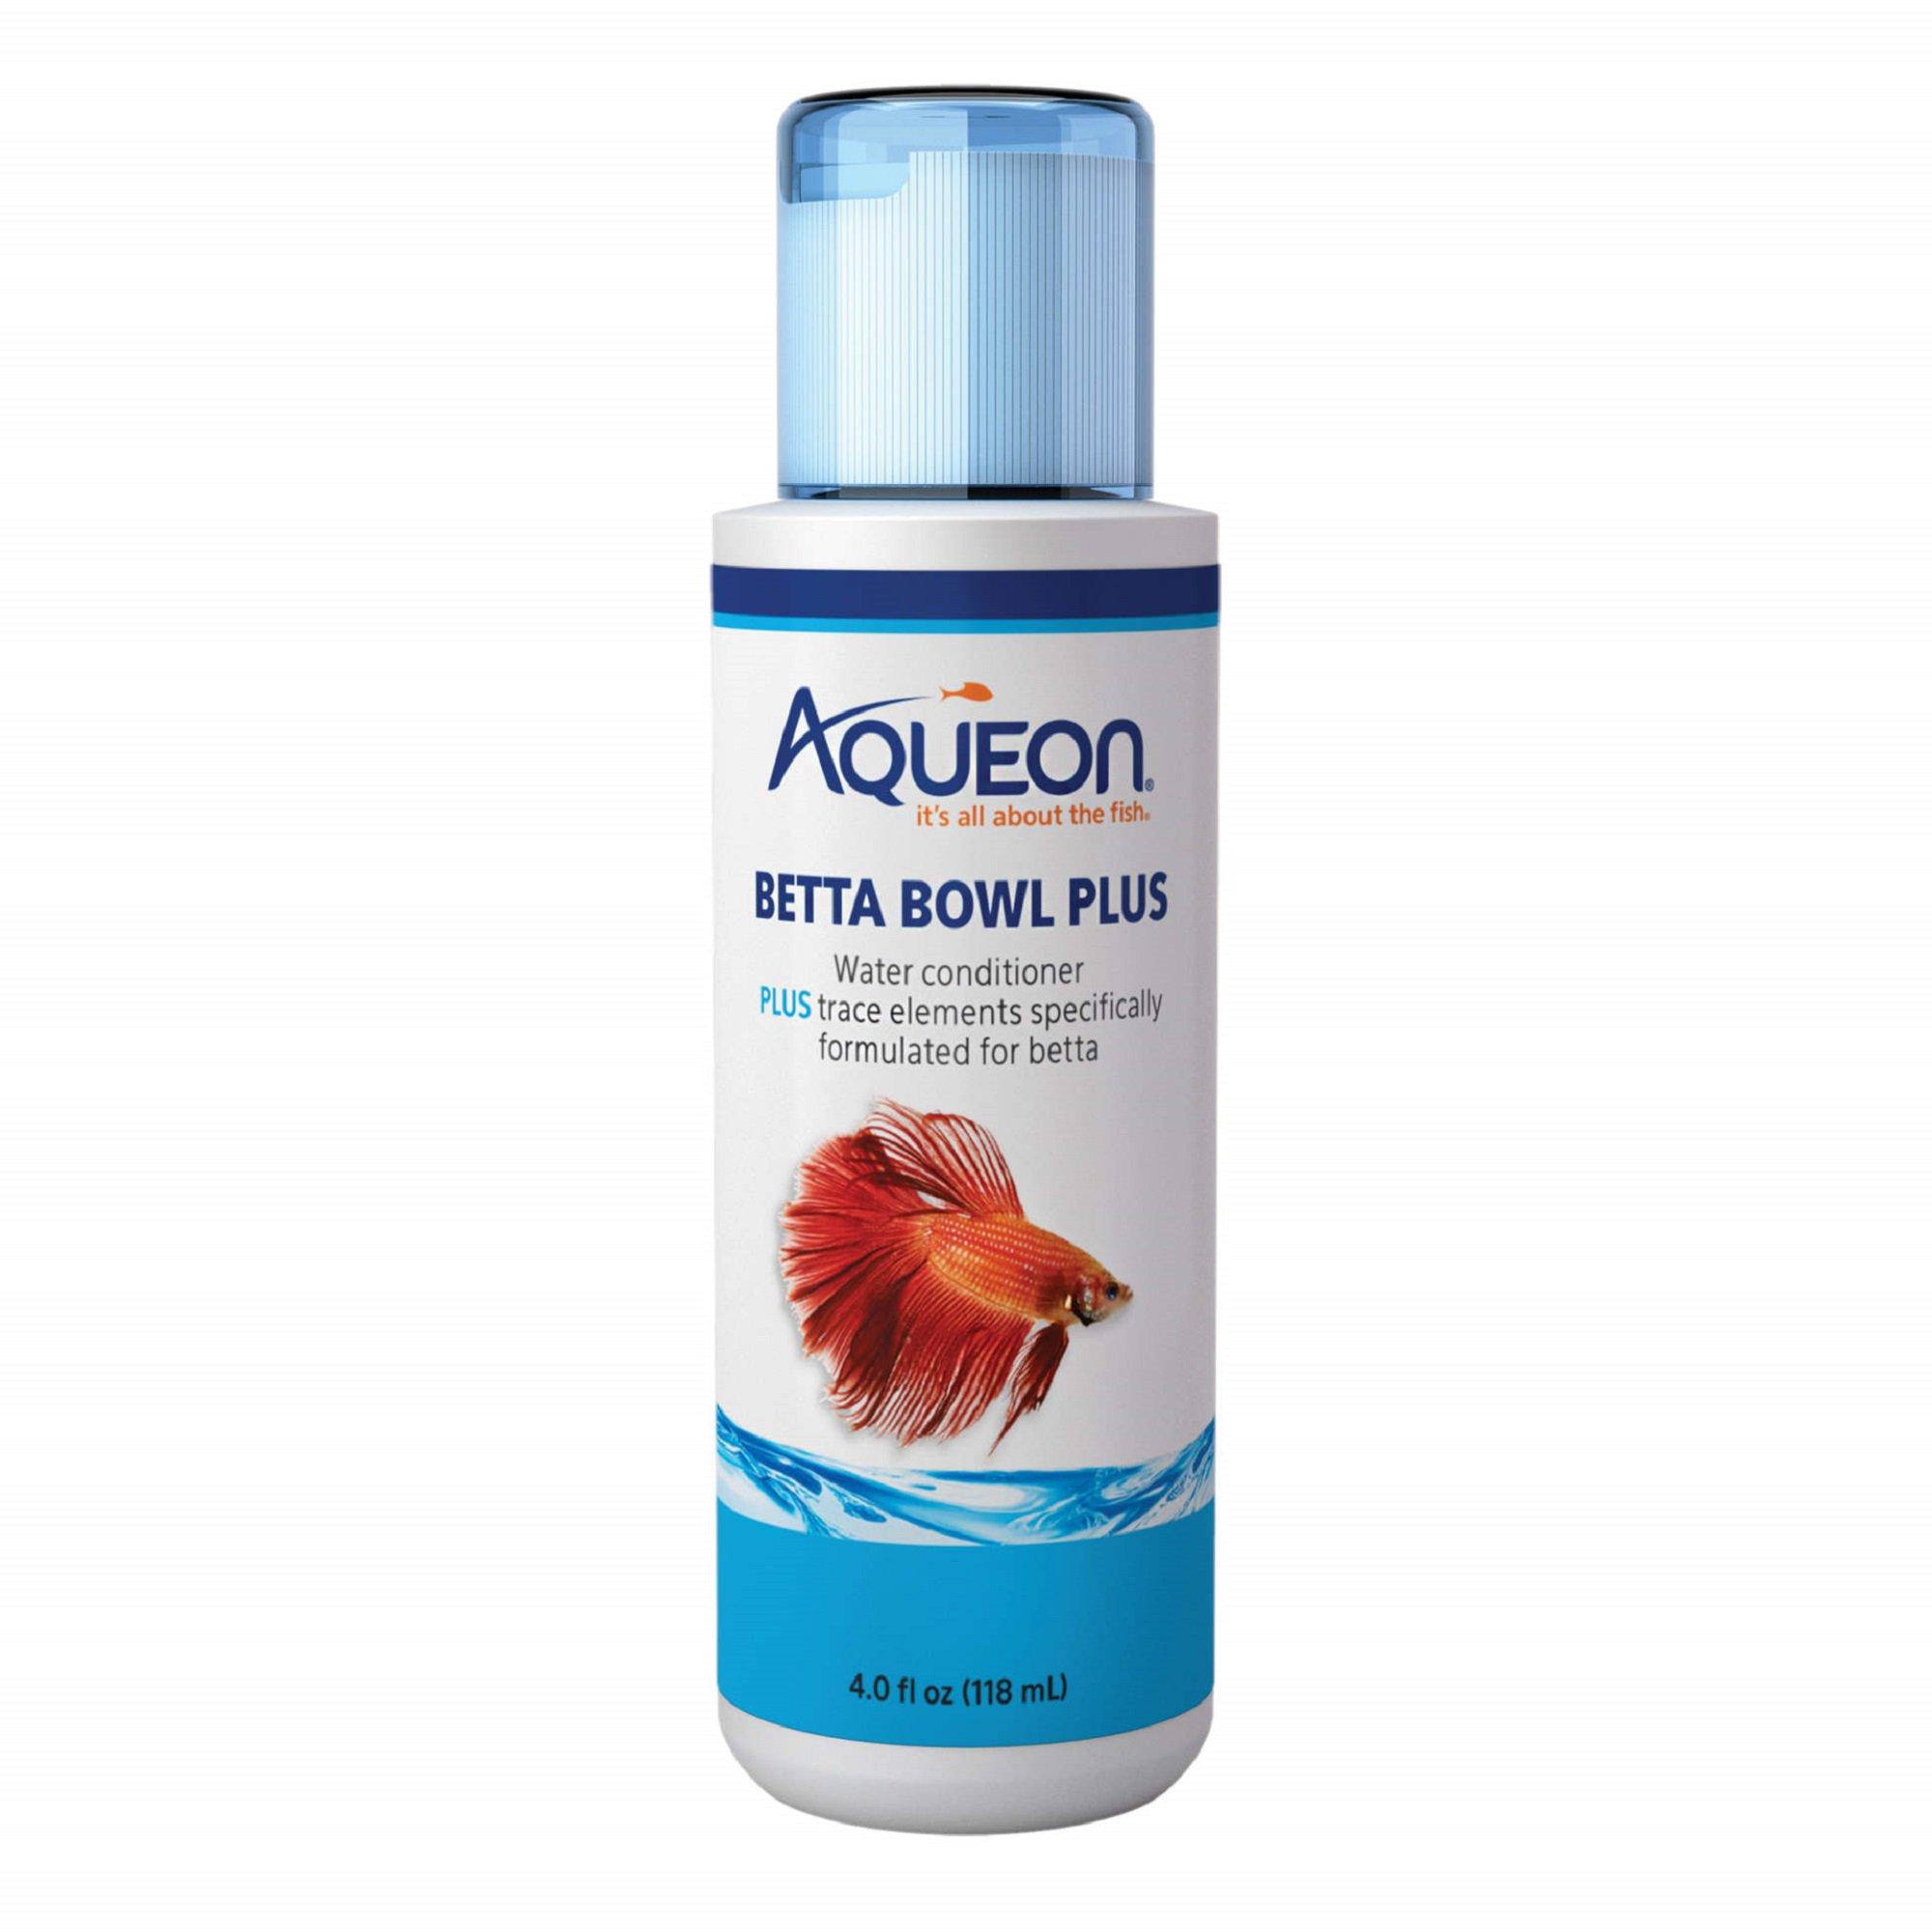 Aqueon Betta Bowl Plus Water Conditioner & Dechlorinator